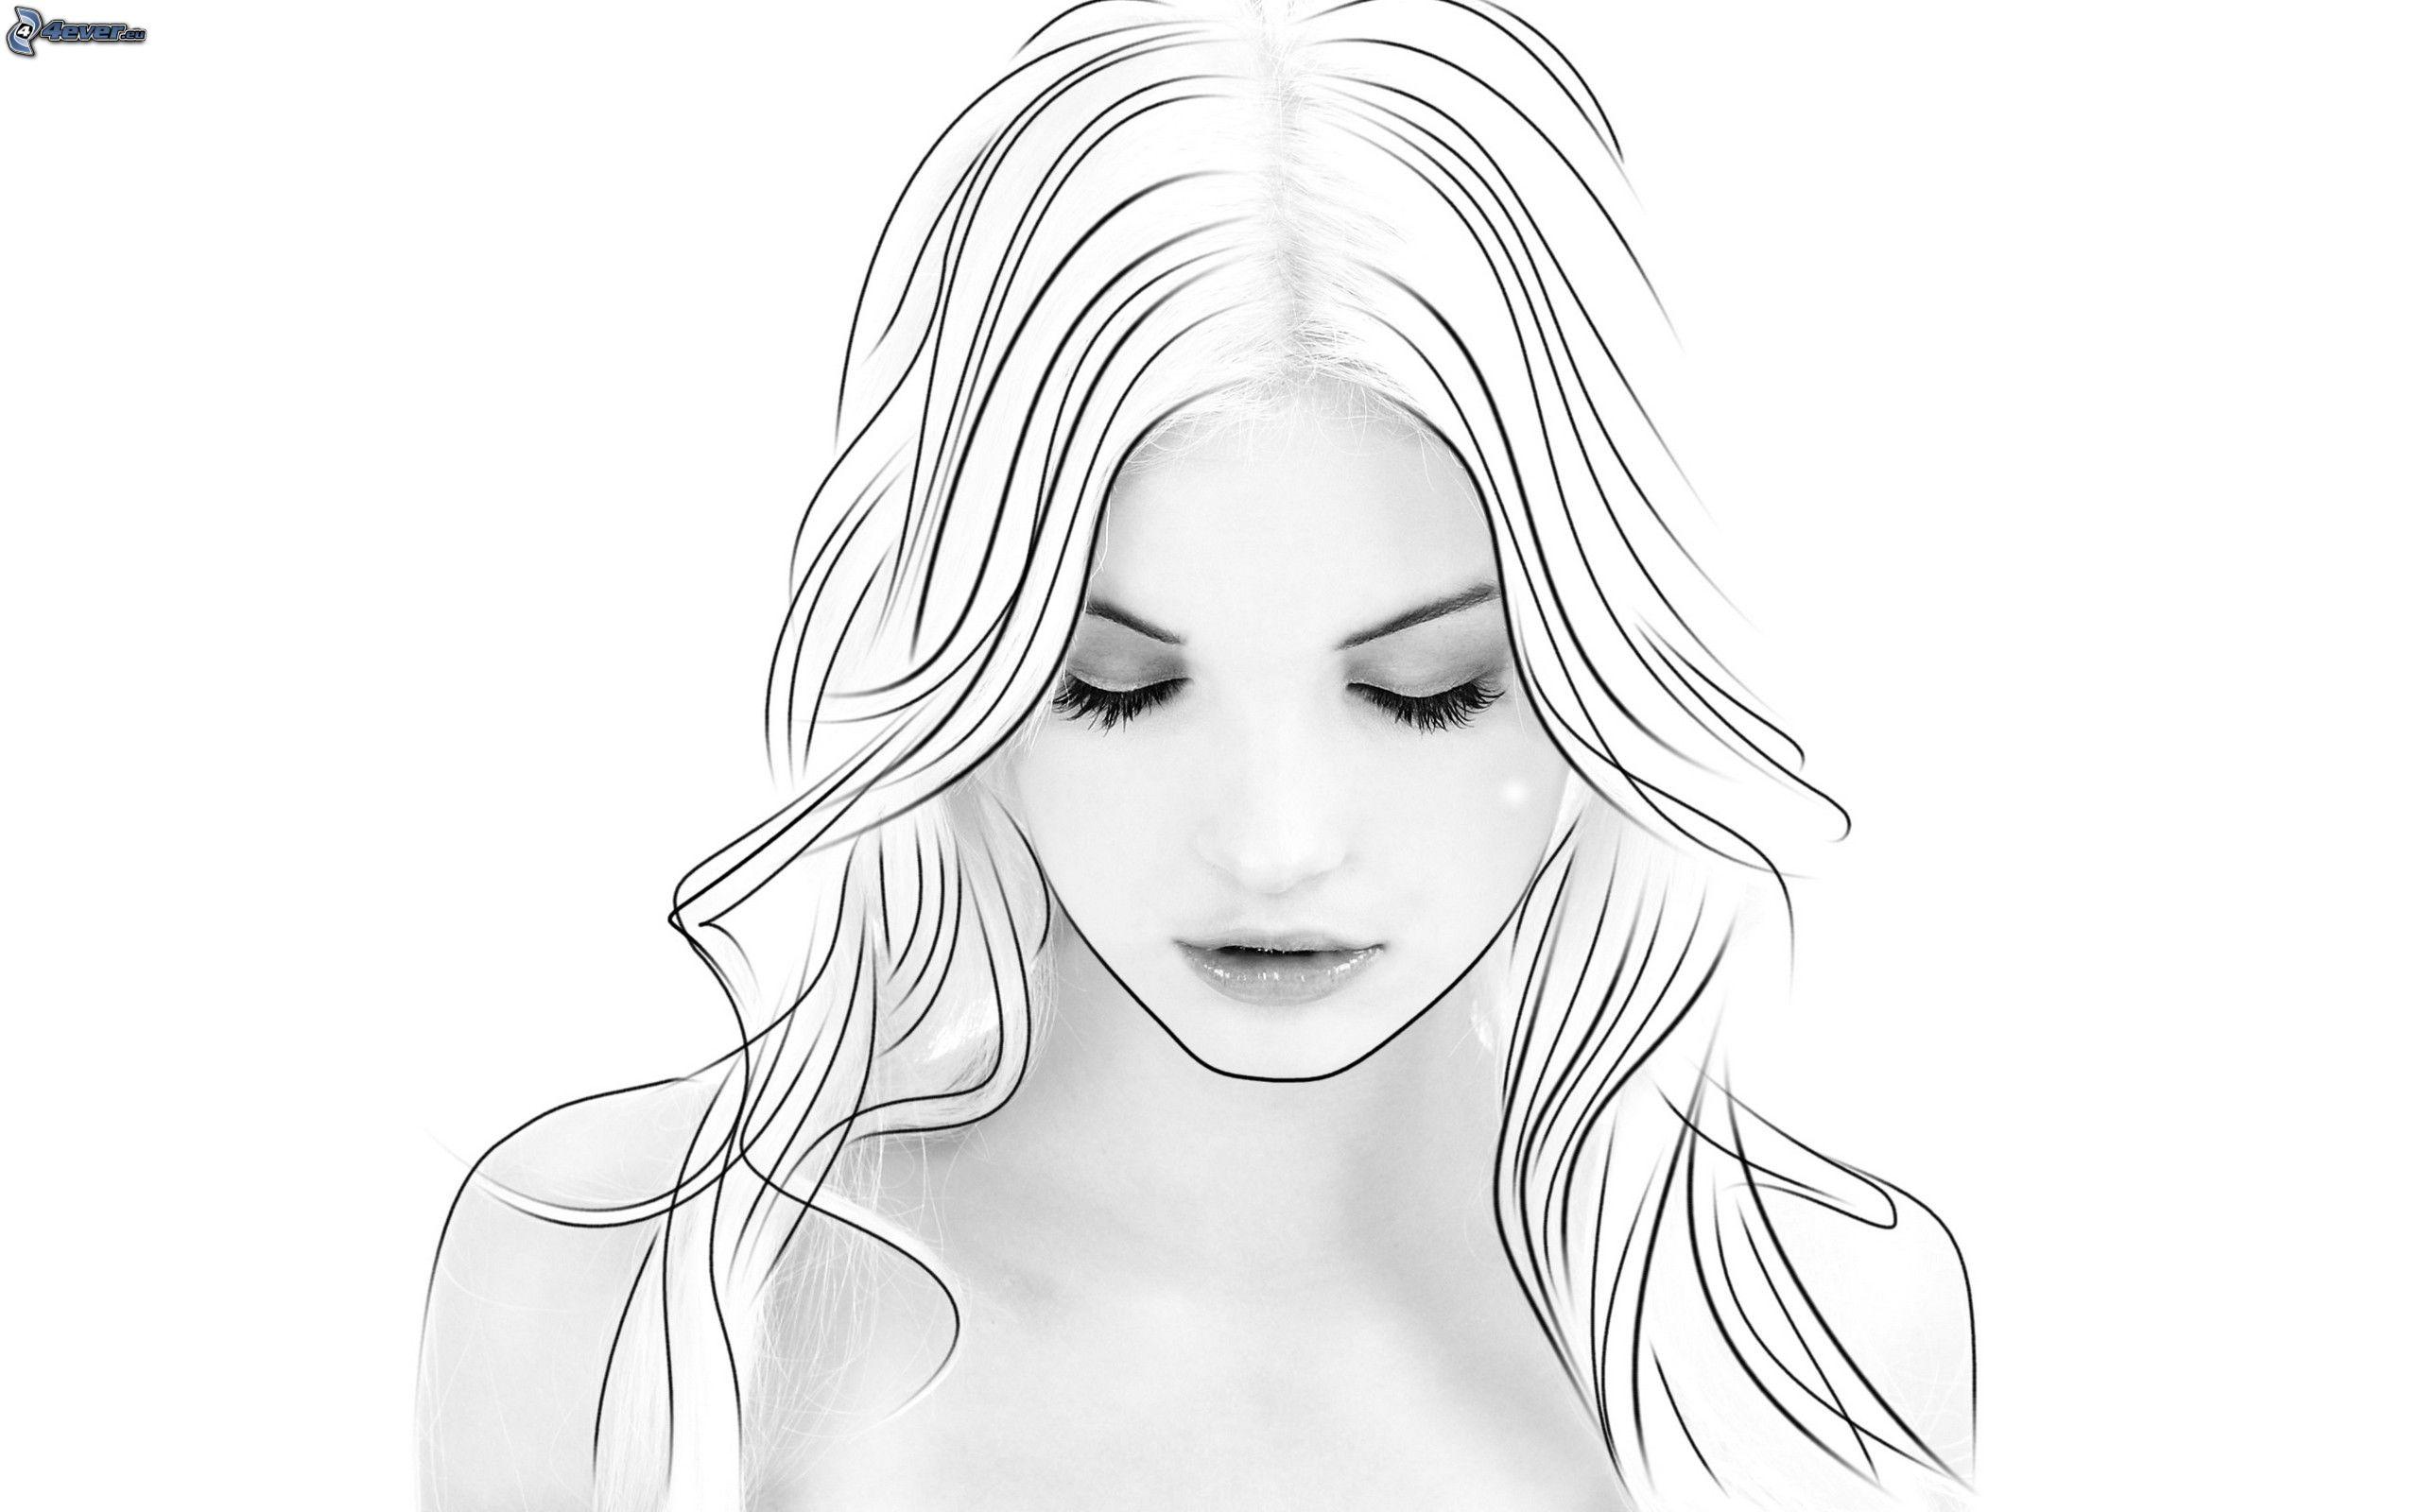 Rostro de mujer hermosa